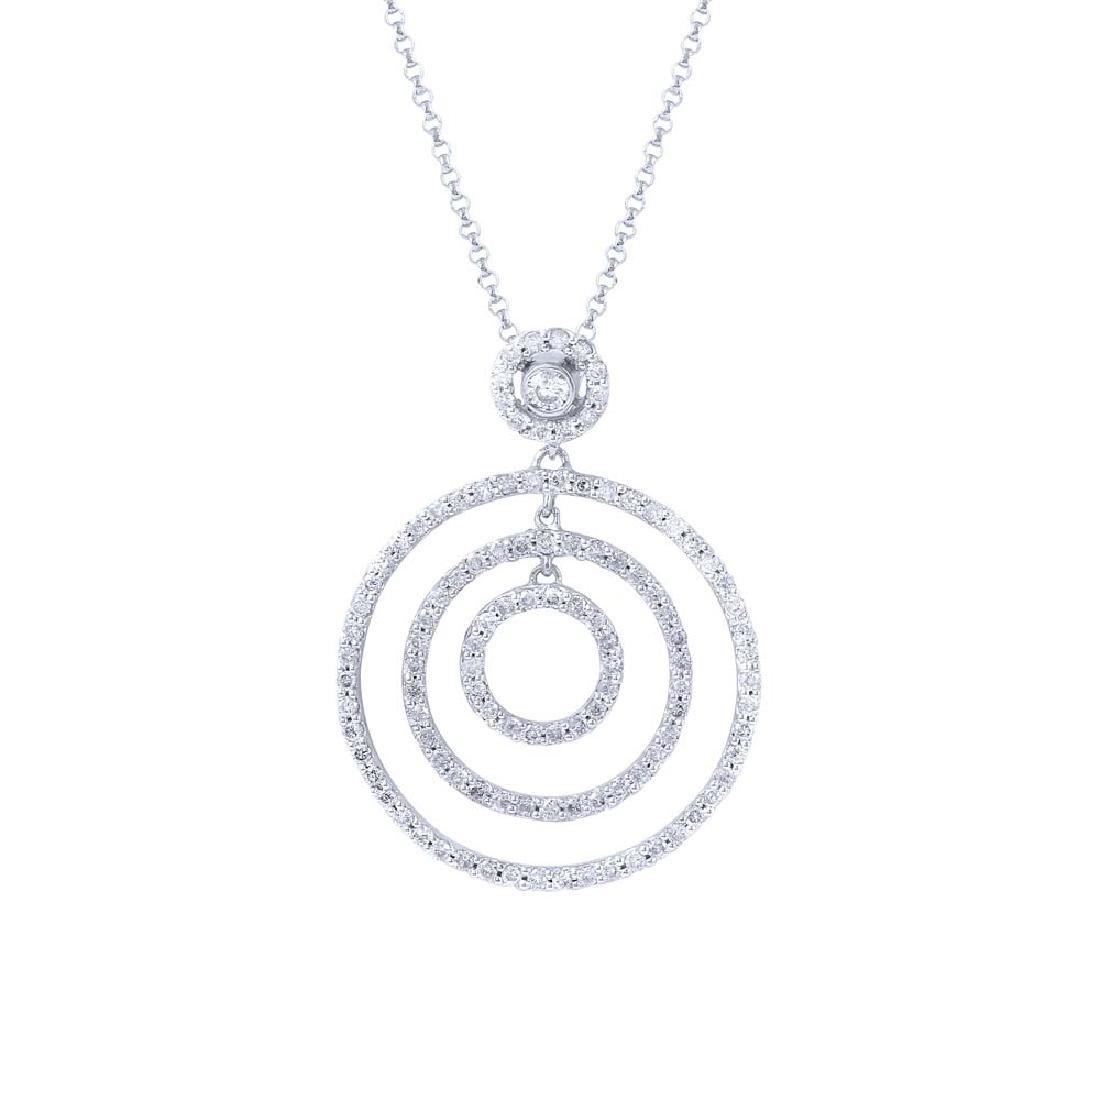 14K White Gold 0.83CTW Ladies Diamond Pendant